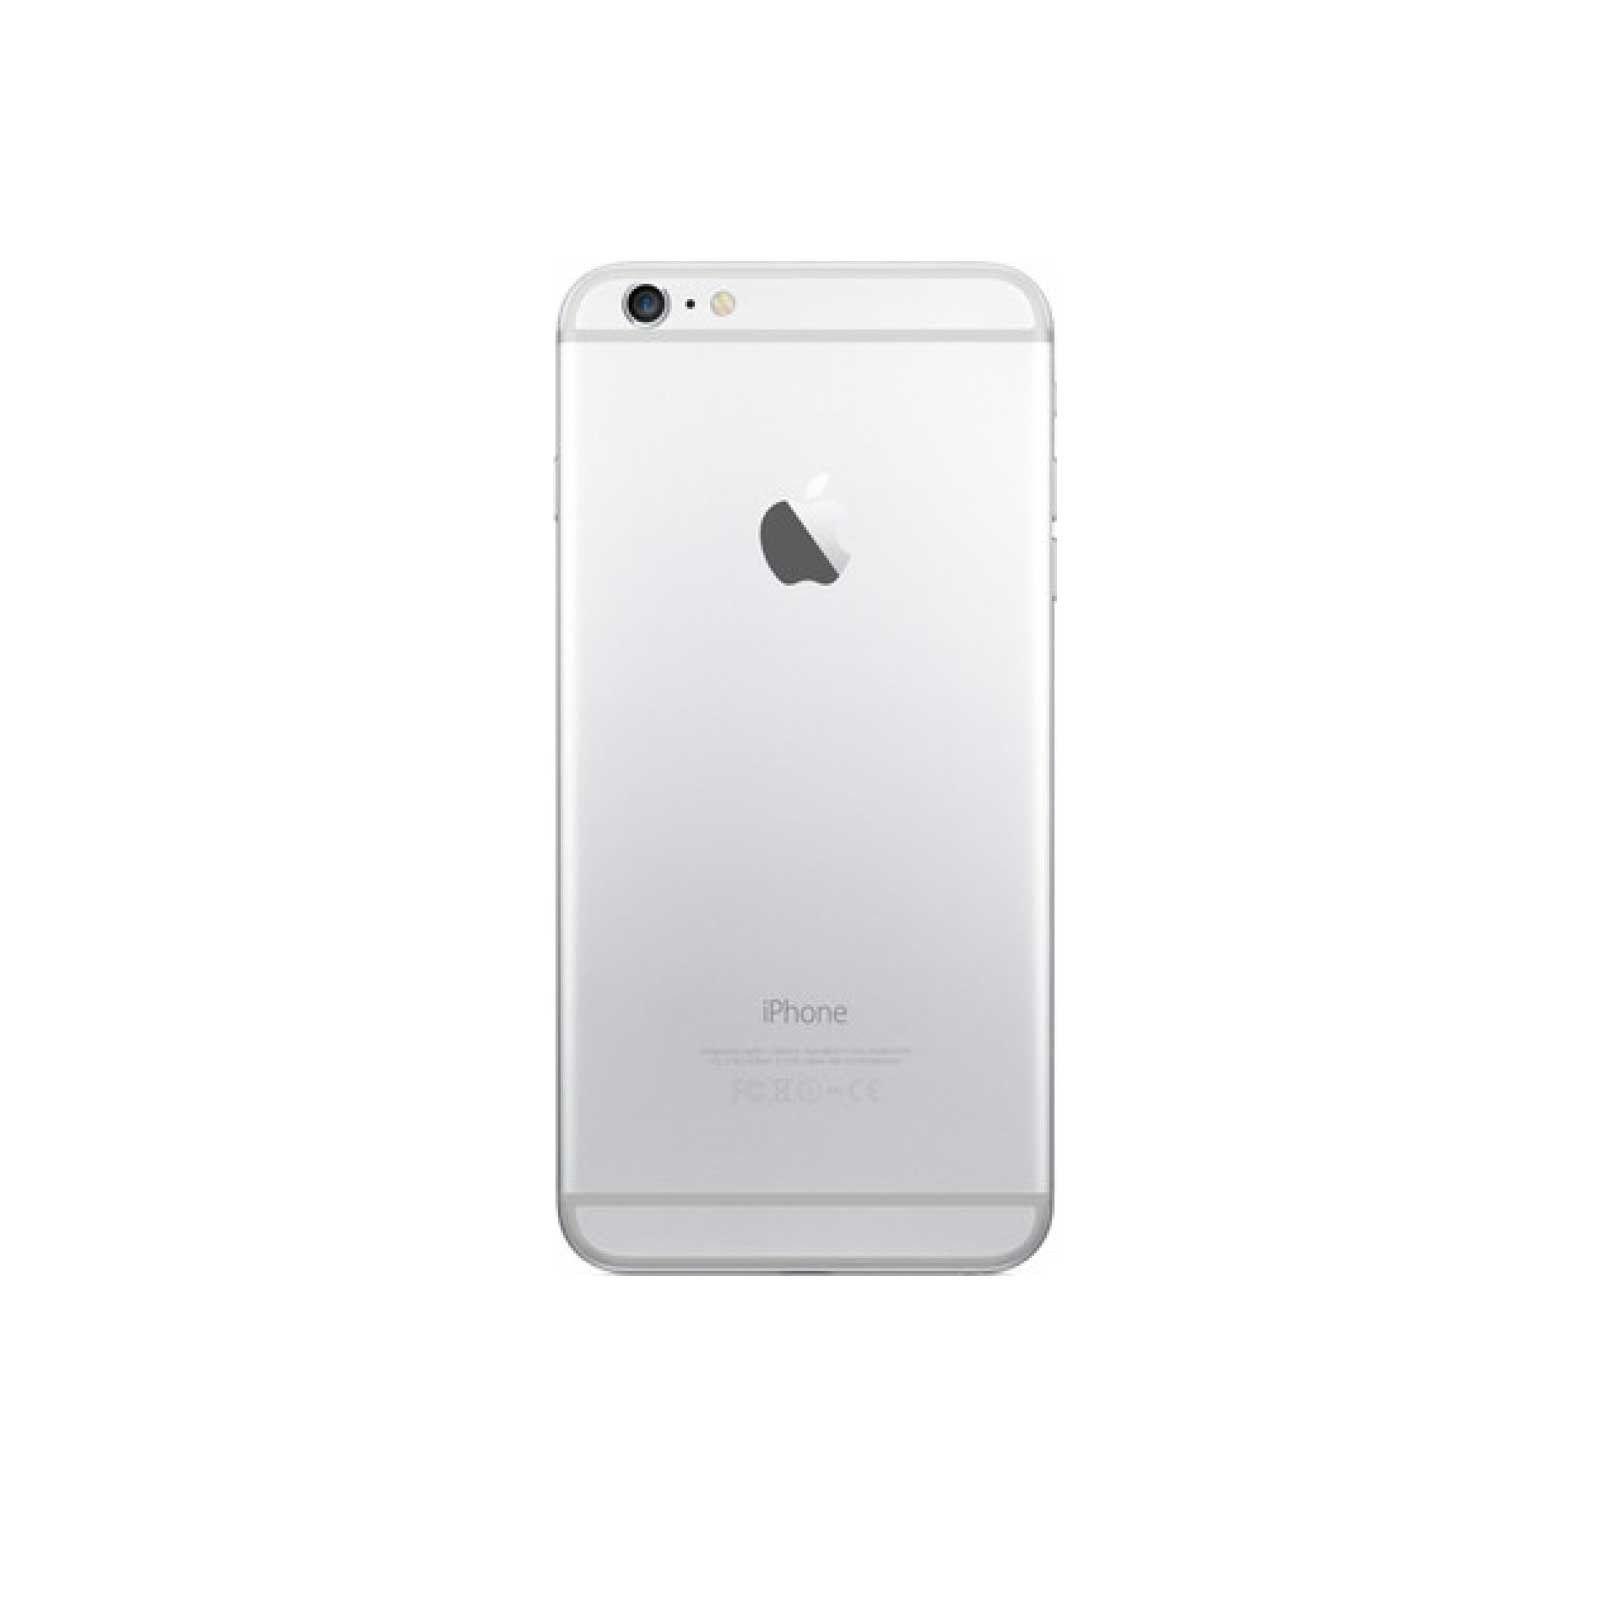 Apple Iphone 6s Plus Silver 64gb Price In India Buy Online Iphone 6s Placewellretail Com Apple Iphone 6s Plus Iphone Iphone 6s